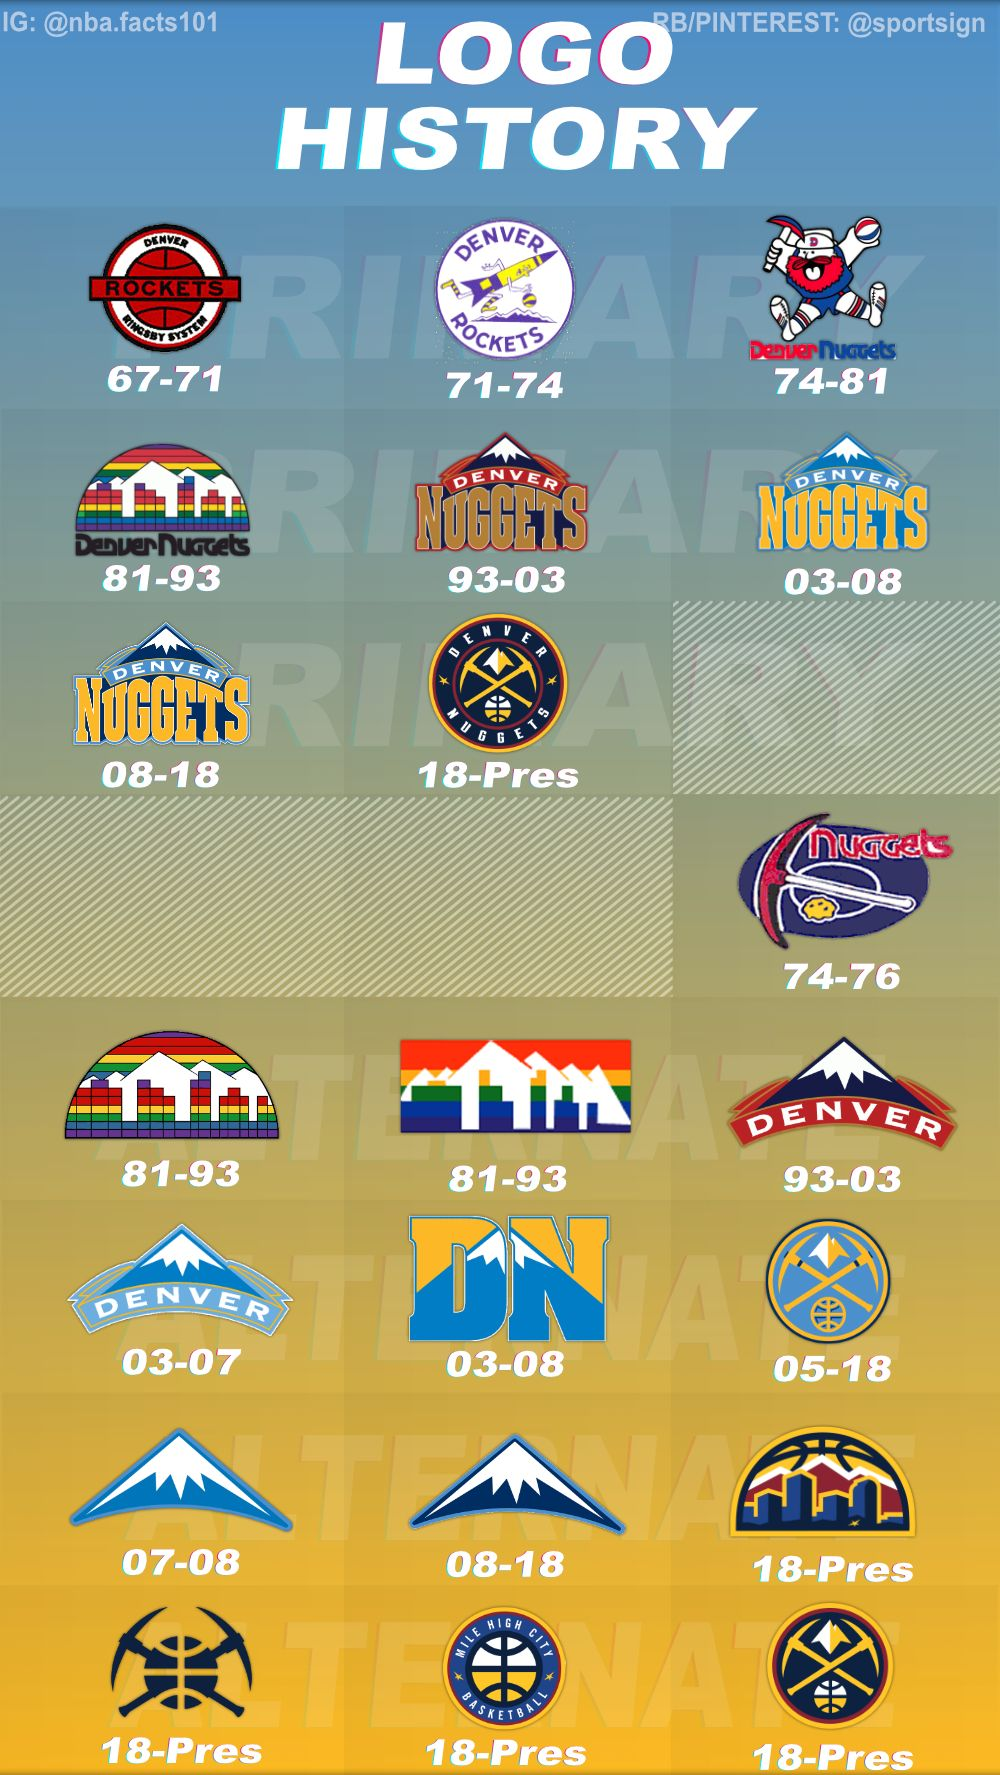 History of the NBA Basketball Denver Nuggets Logos